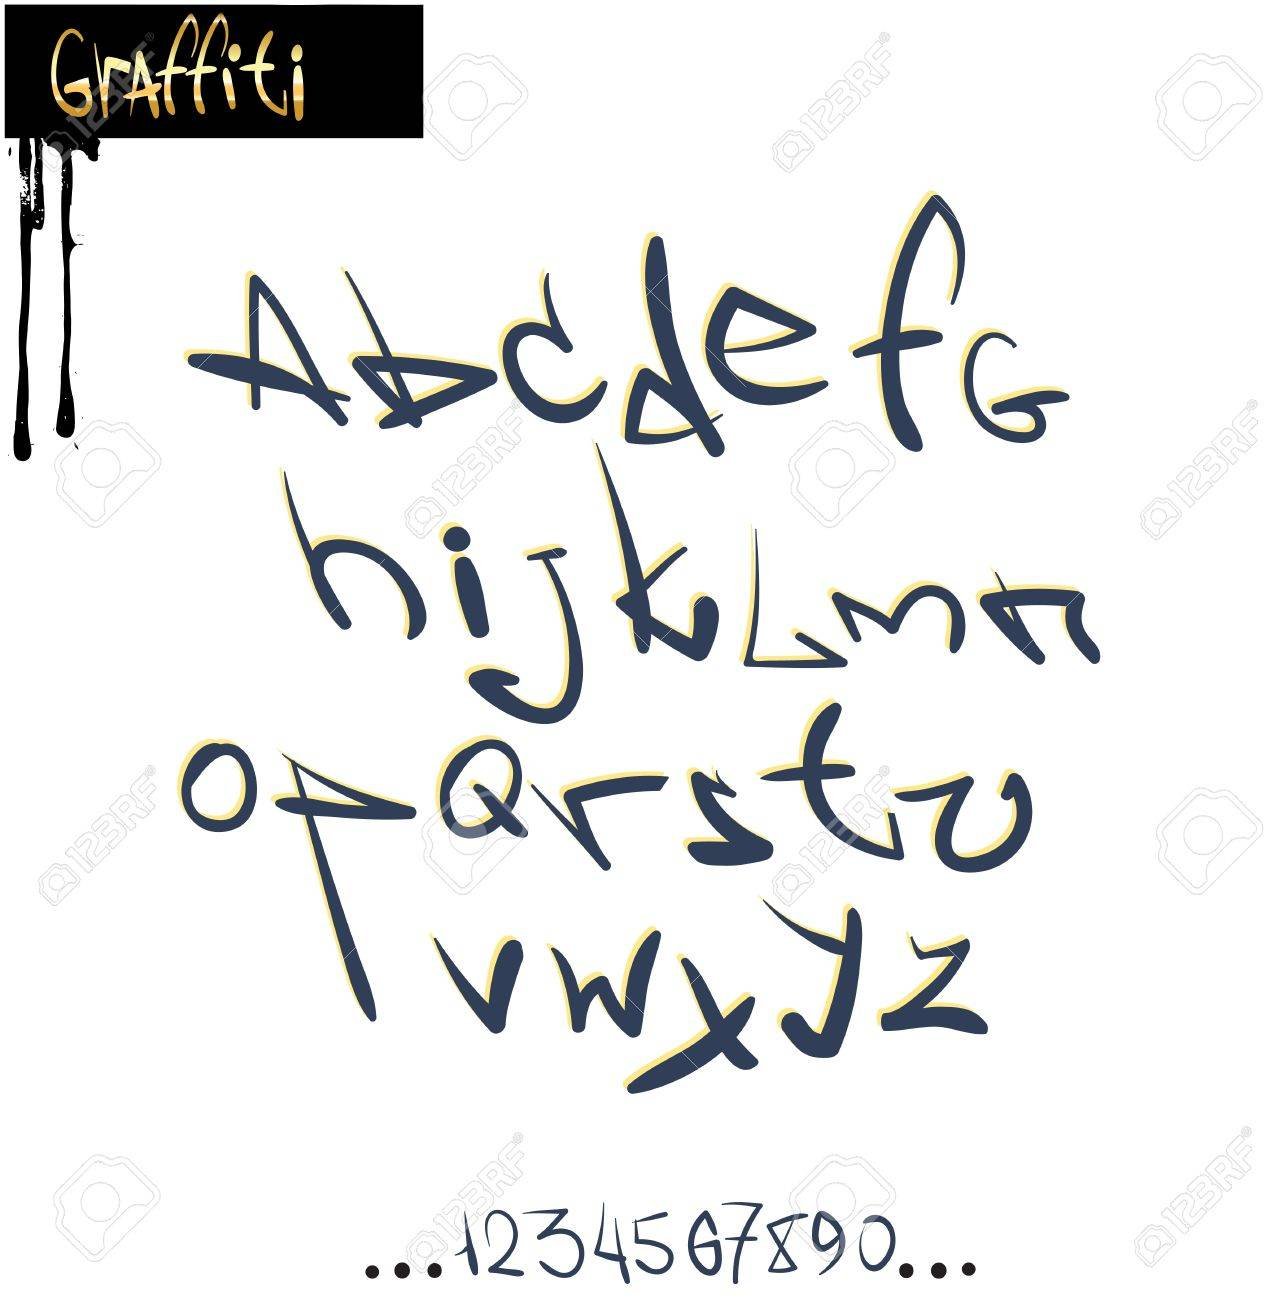 Graffiti font alphabet, abc letters Standard-Bild - 11486047